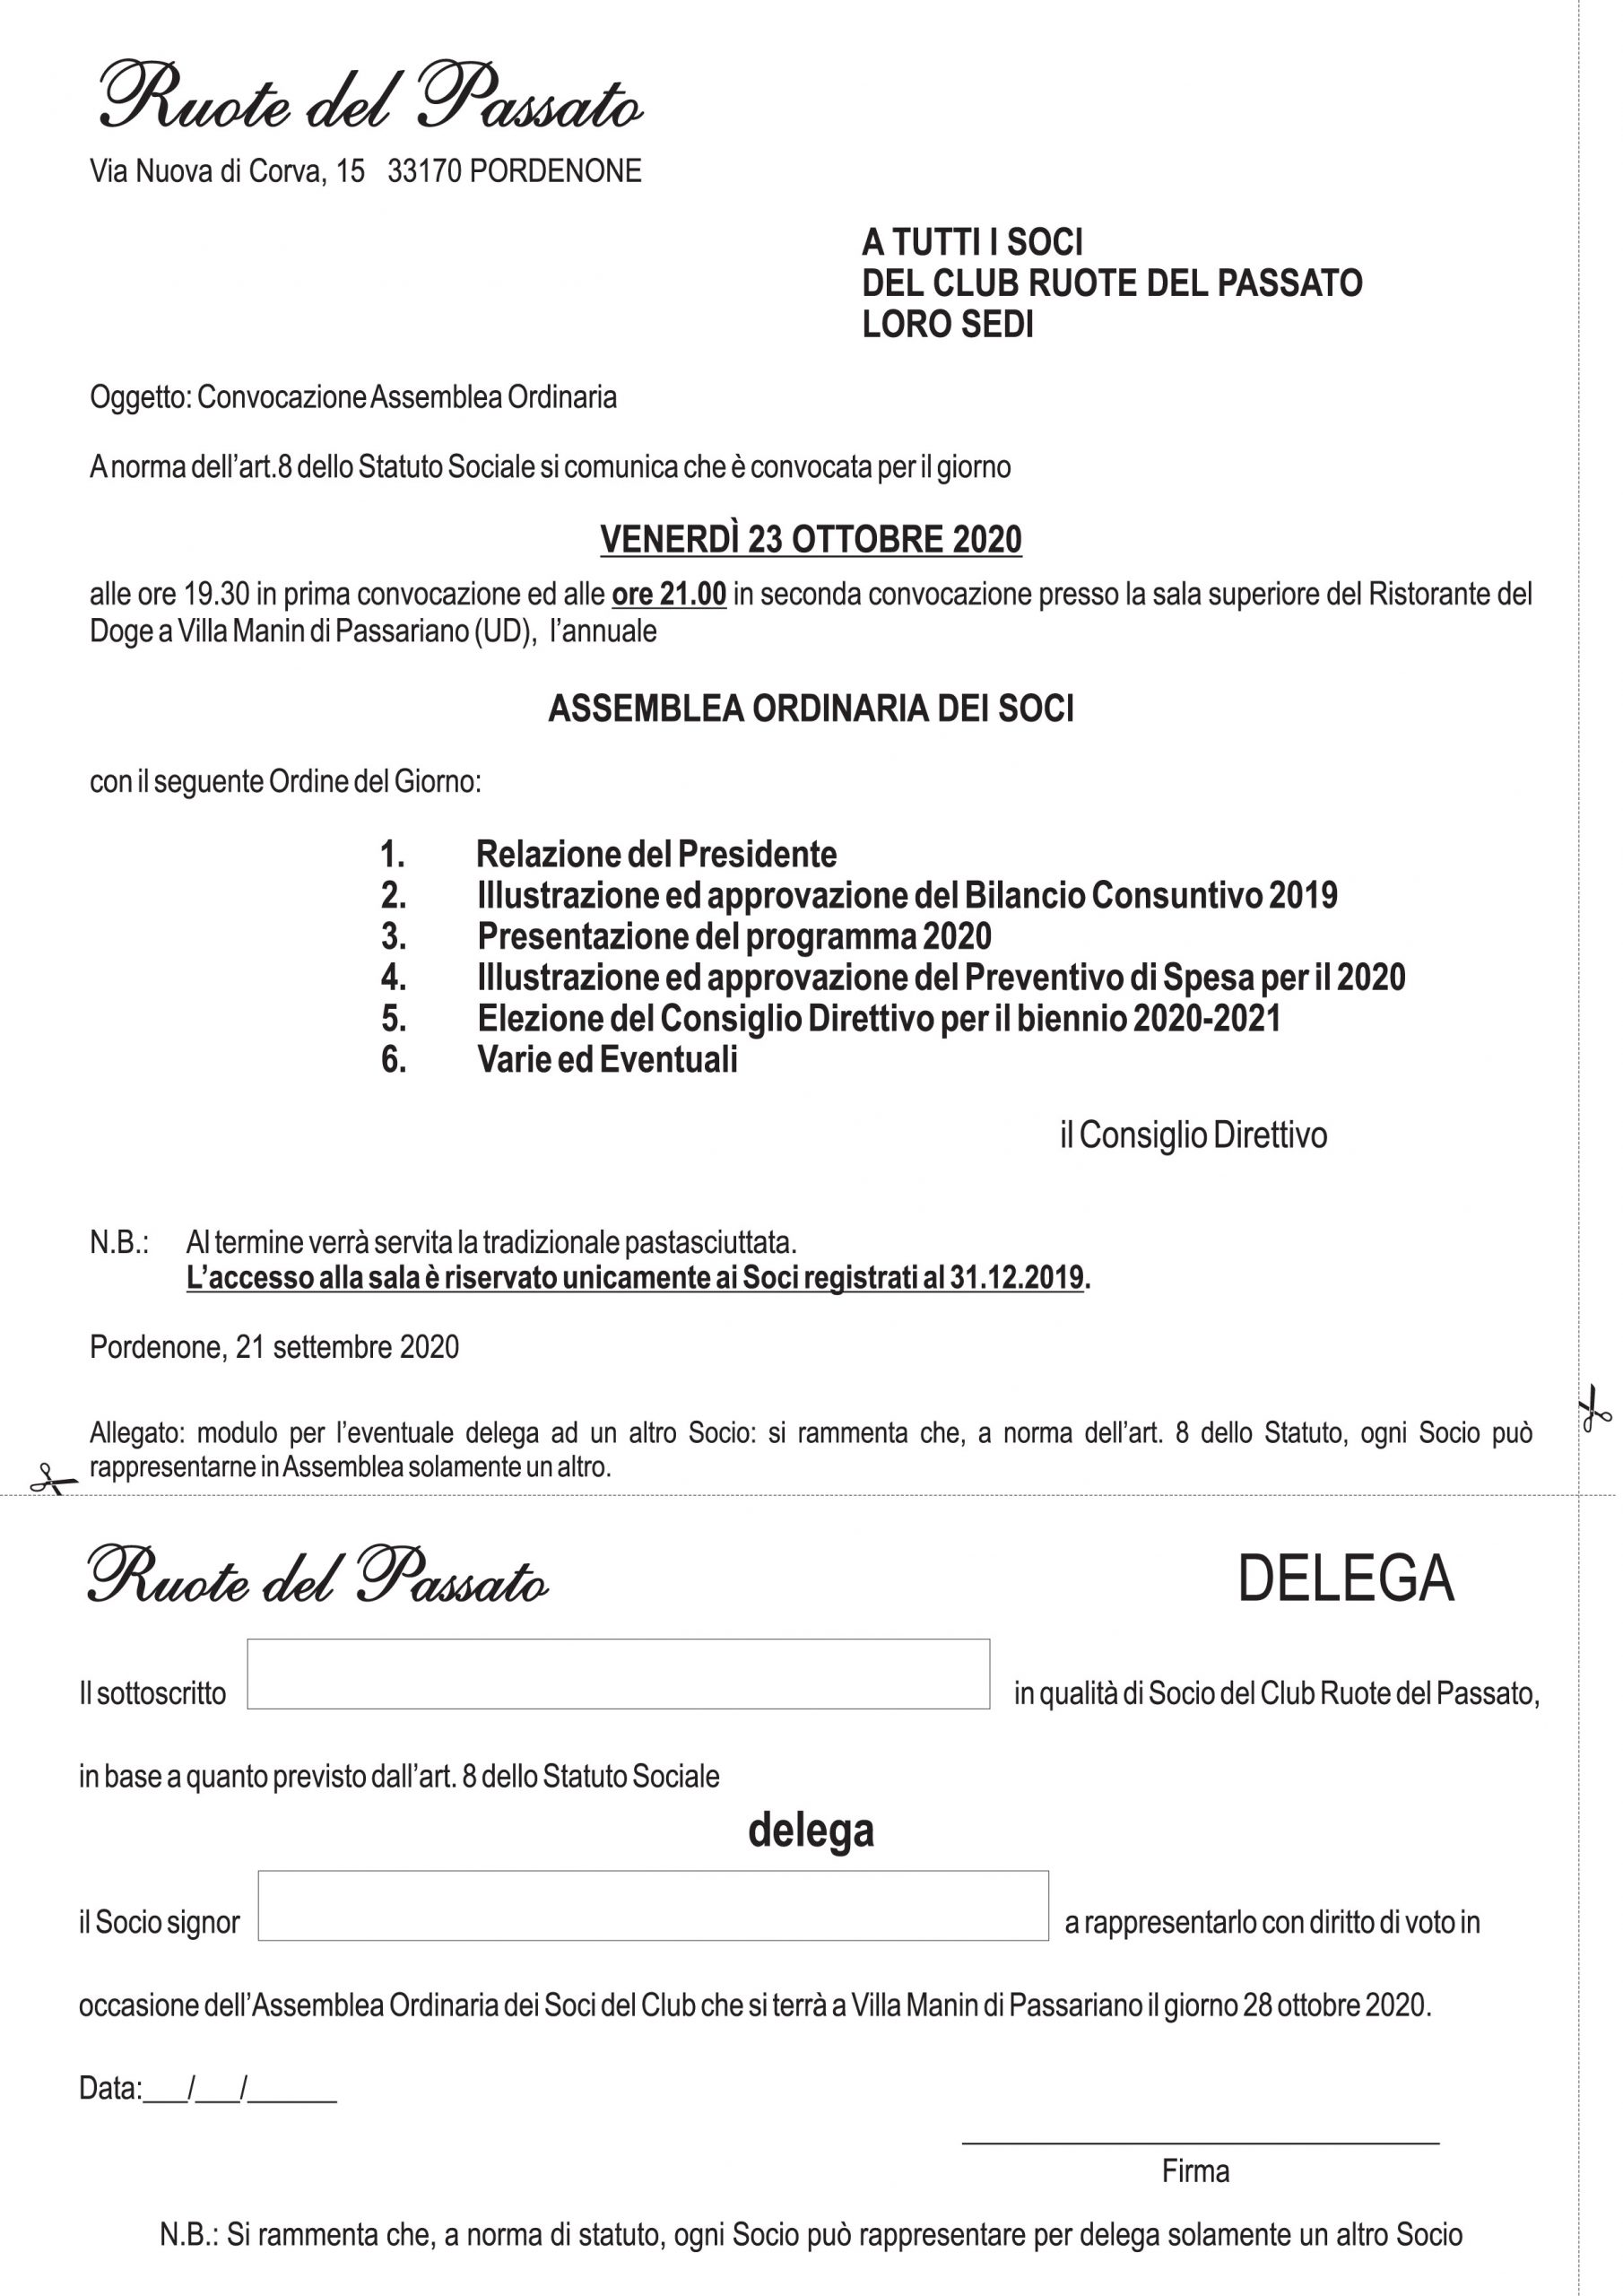 CONVOCAZIONE ASSEMBLEA ORDINARIA VENERDI 23 OTTOBRE 2020